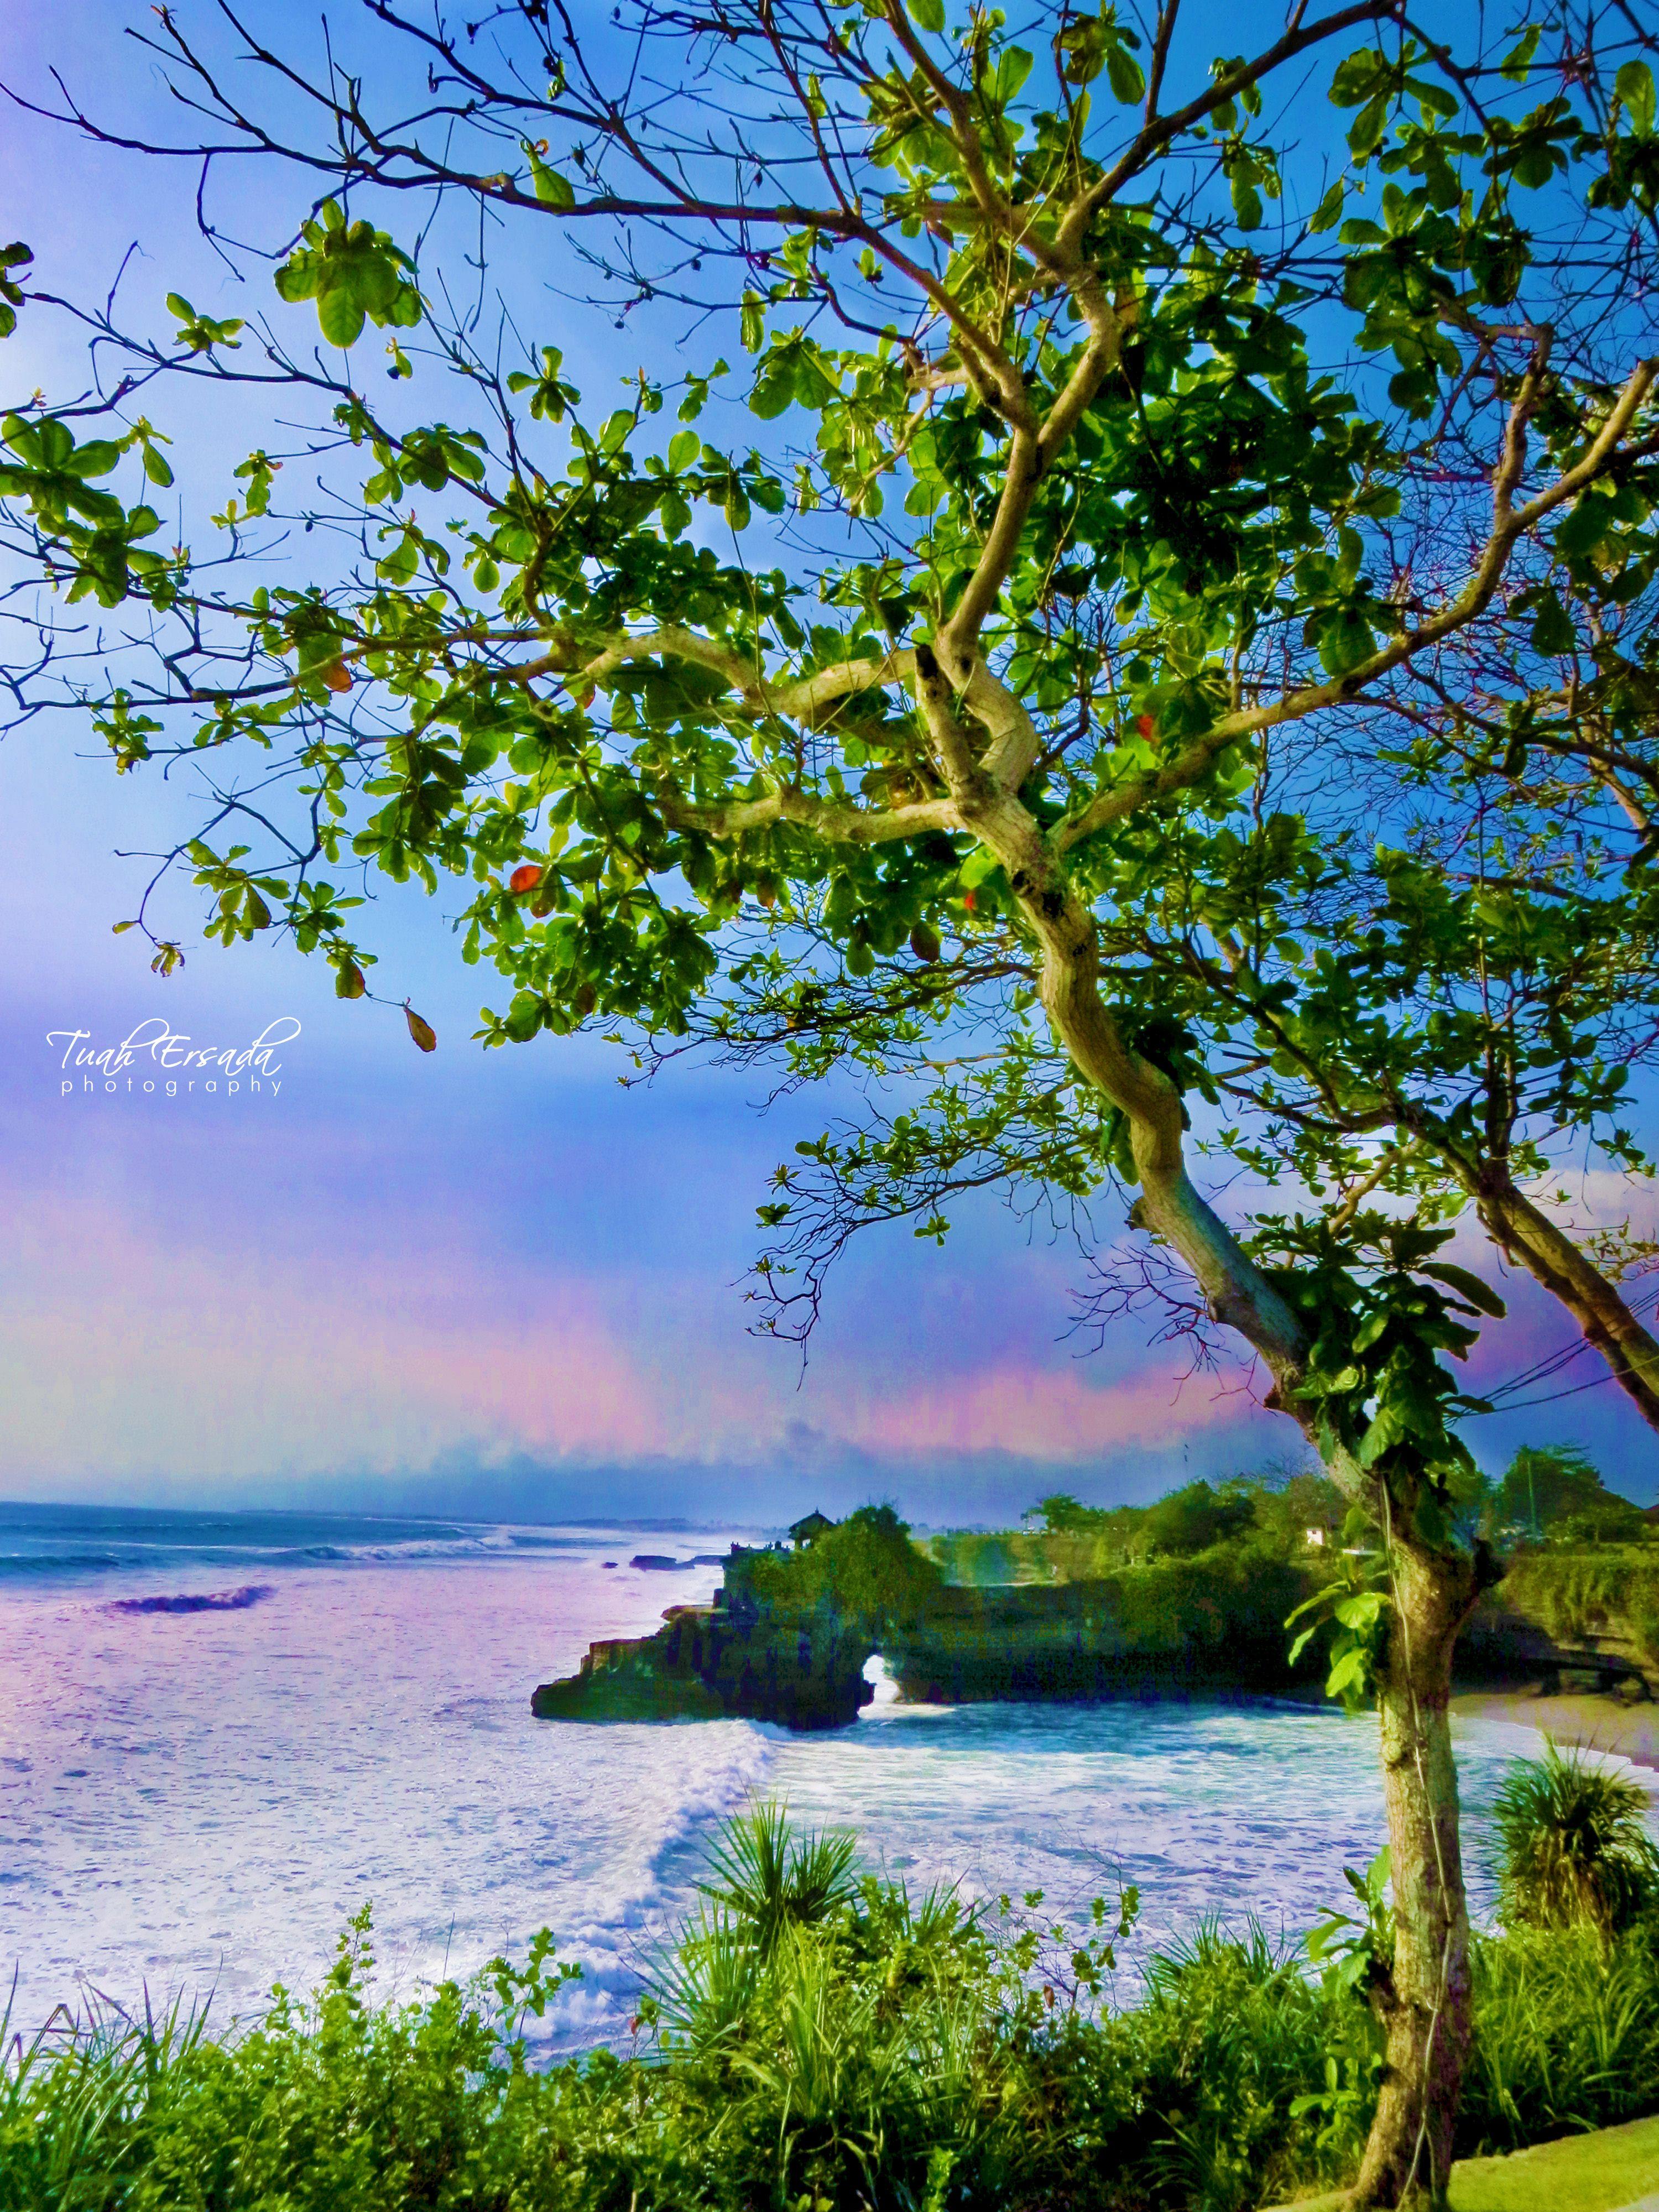 Travel Landscape Photography Nature Tree Grass Leaf Blue Green Sky Beach Land Rock Bali Is Landscape Photography Photography Amazing Photography